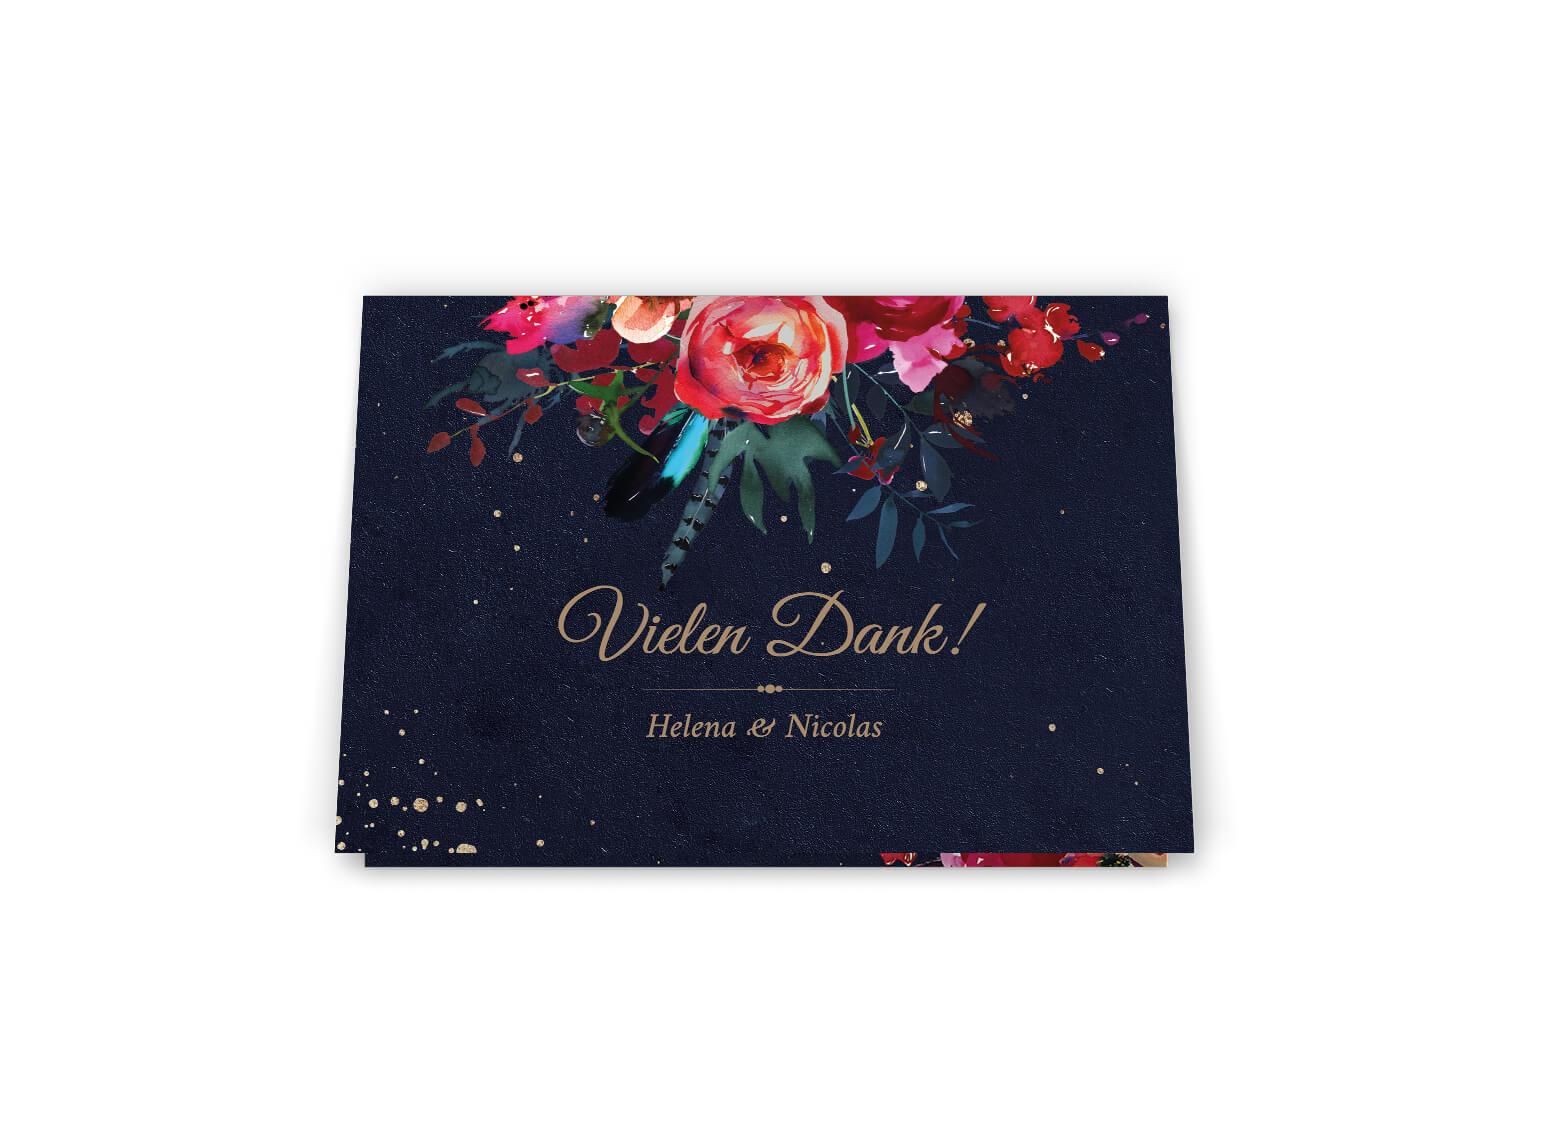 Nacht Dankeskarte Boho Hochzeit | dunkle Blumenverzierte Dankeskarte Klappkarte Din A6